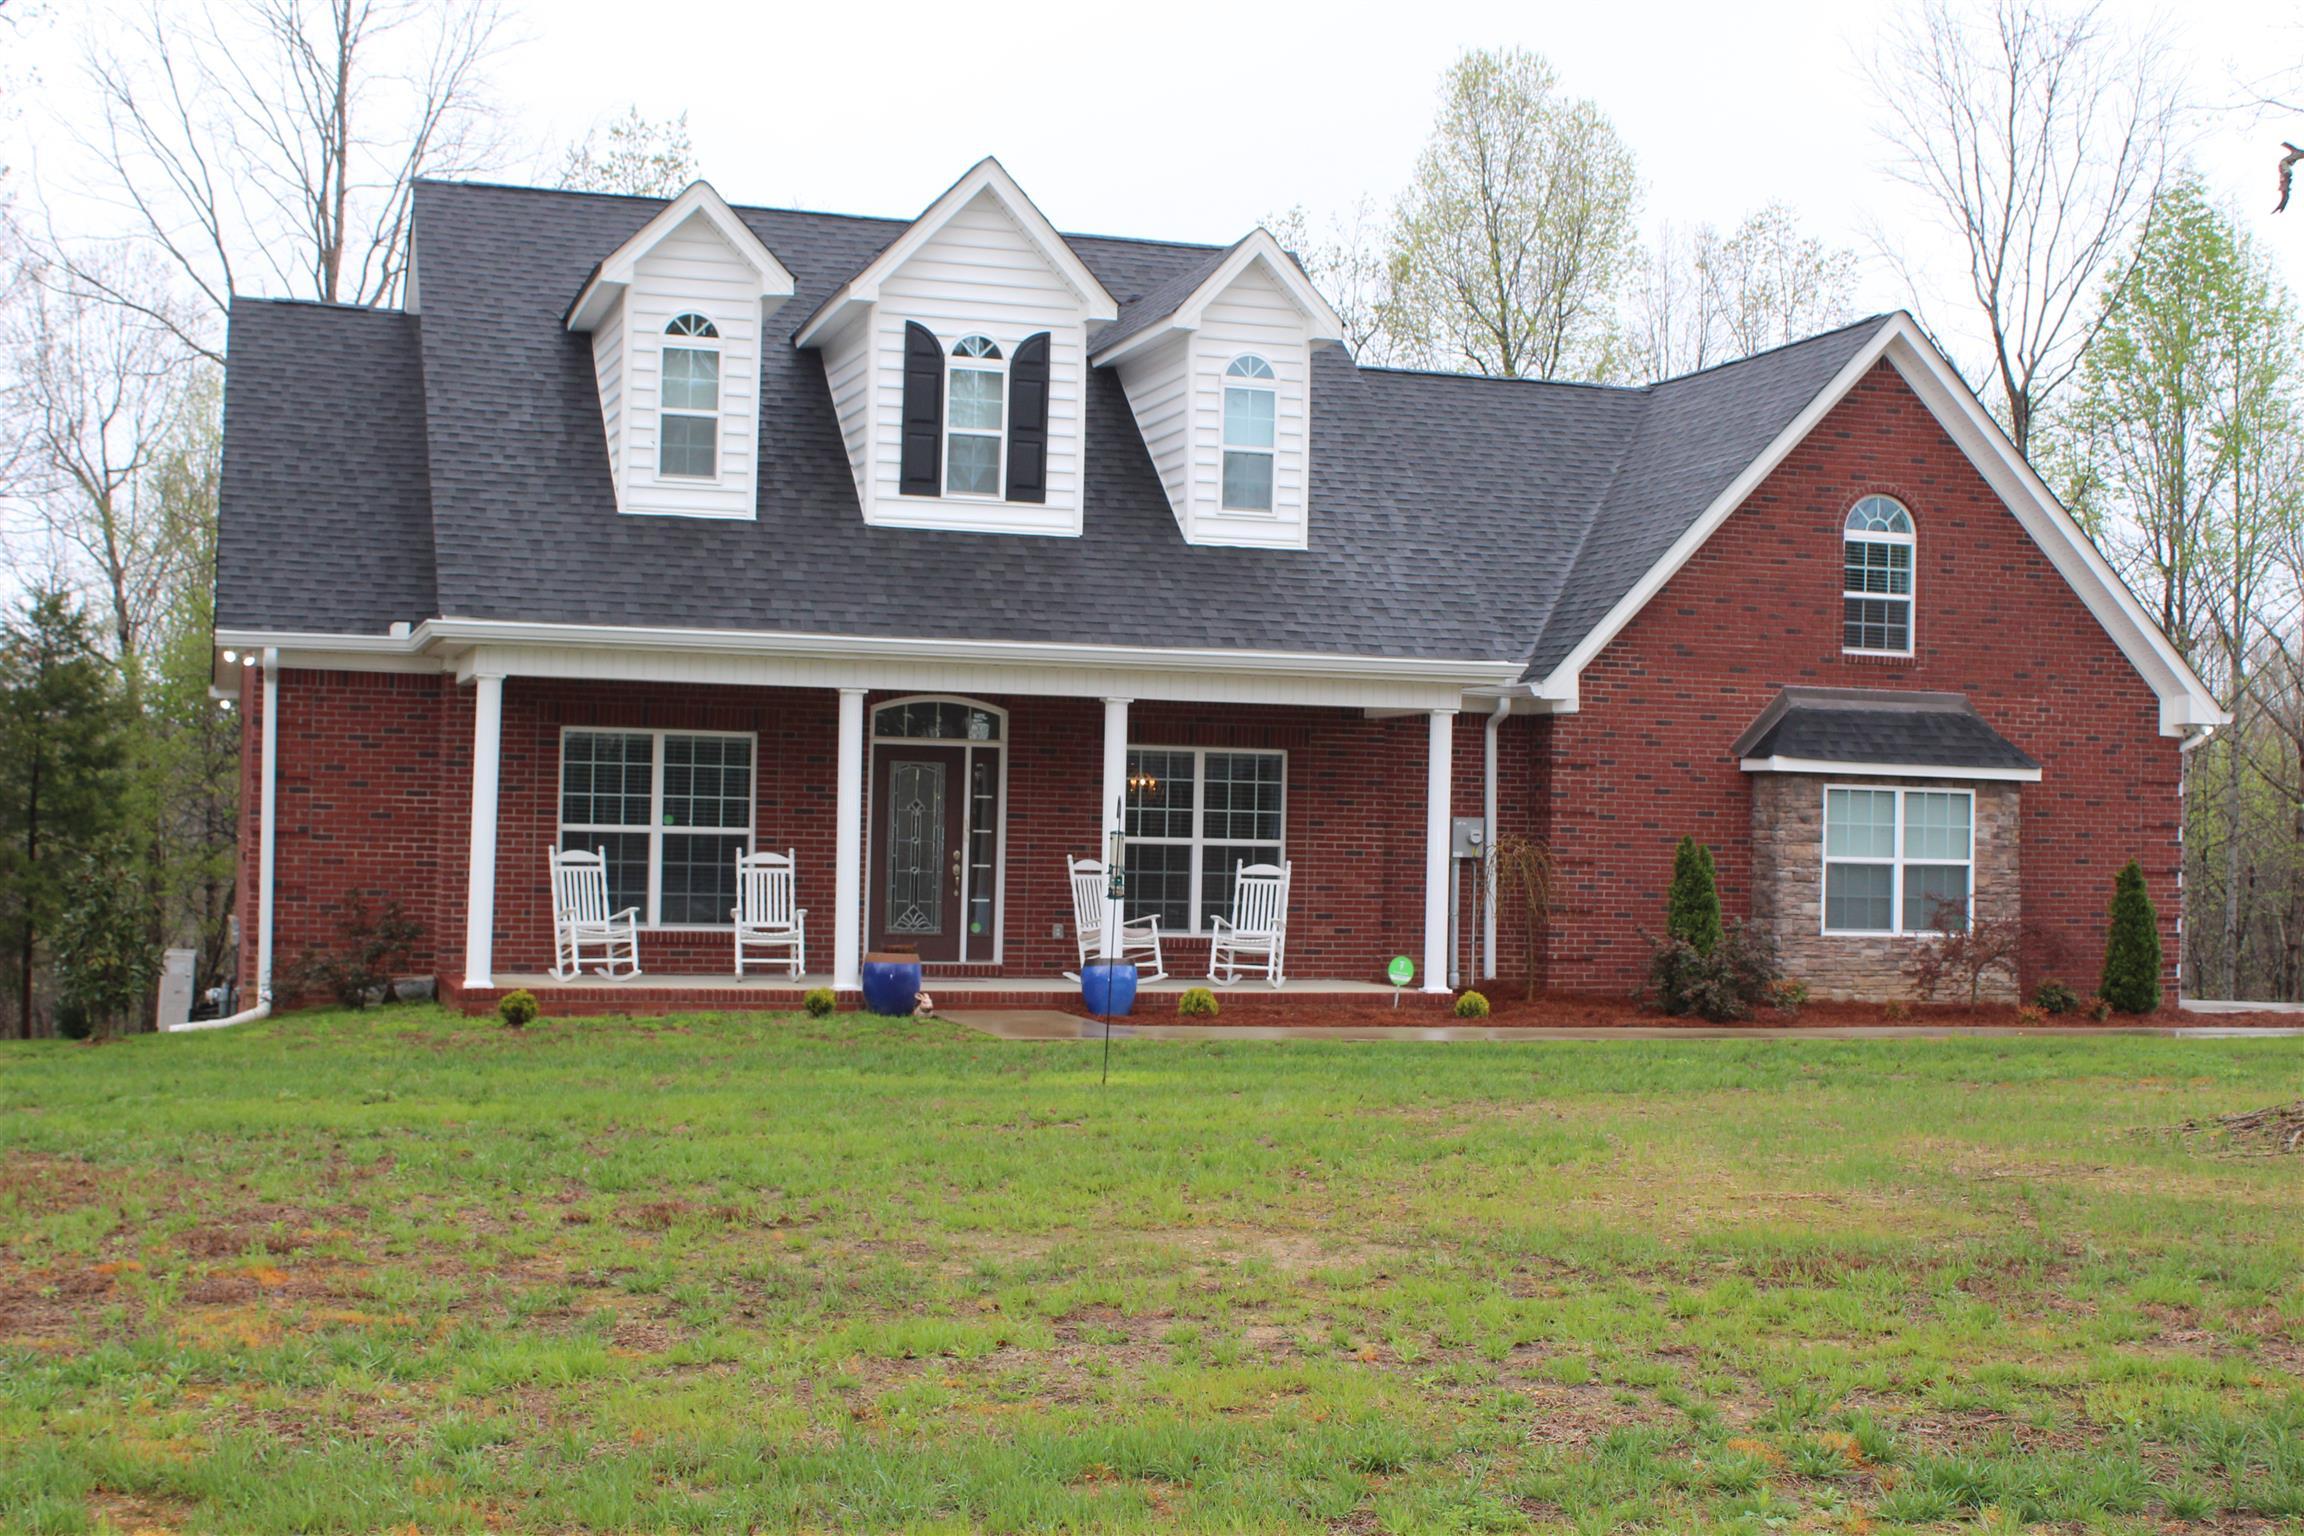 151 Saddlebrook, Hohenwald, TN 38462 - Hohenwald, TN real estate listing